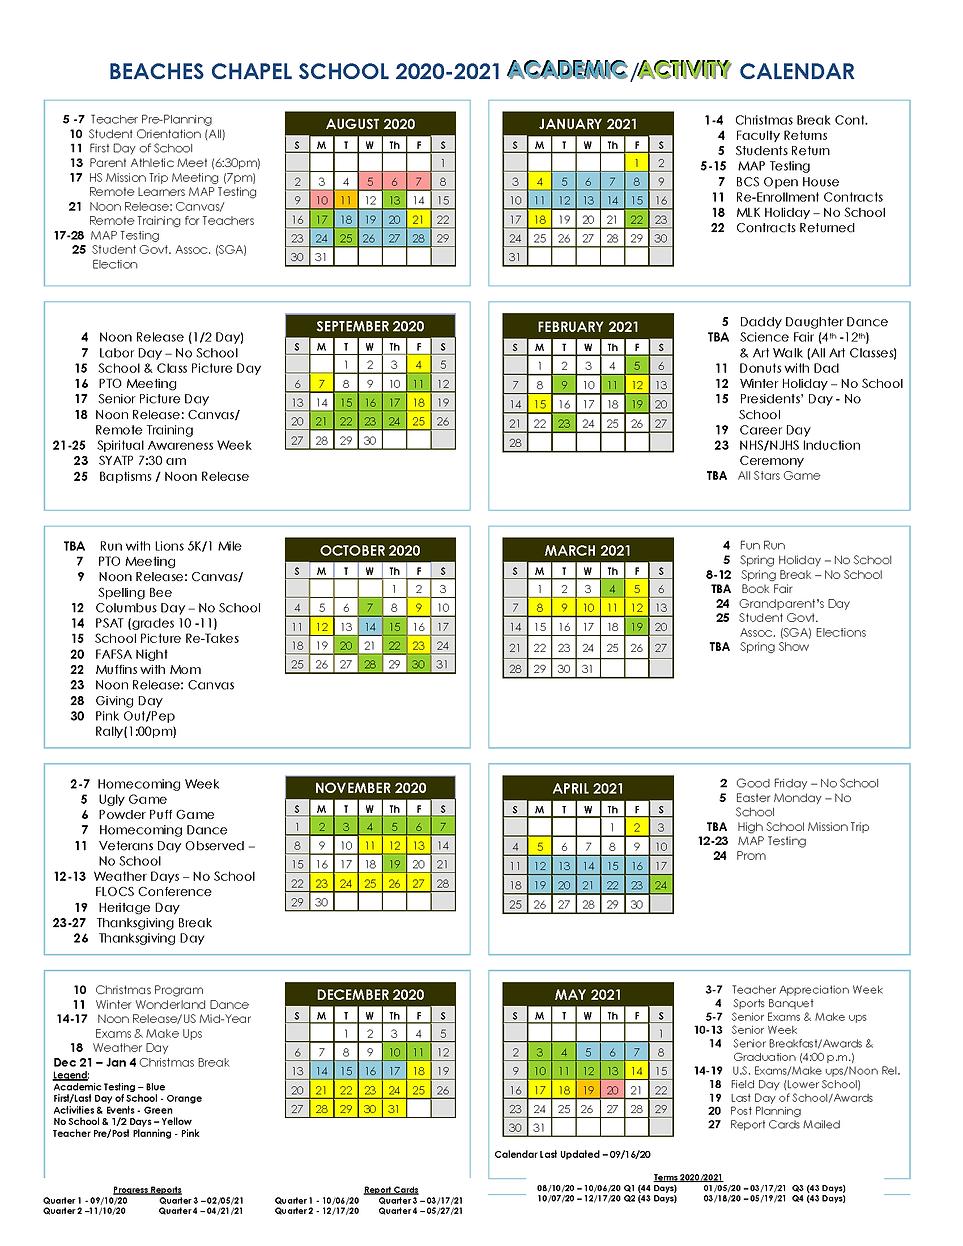 BCS 2020-21 9.16 updated Academic Activi